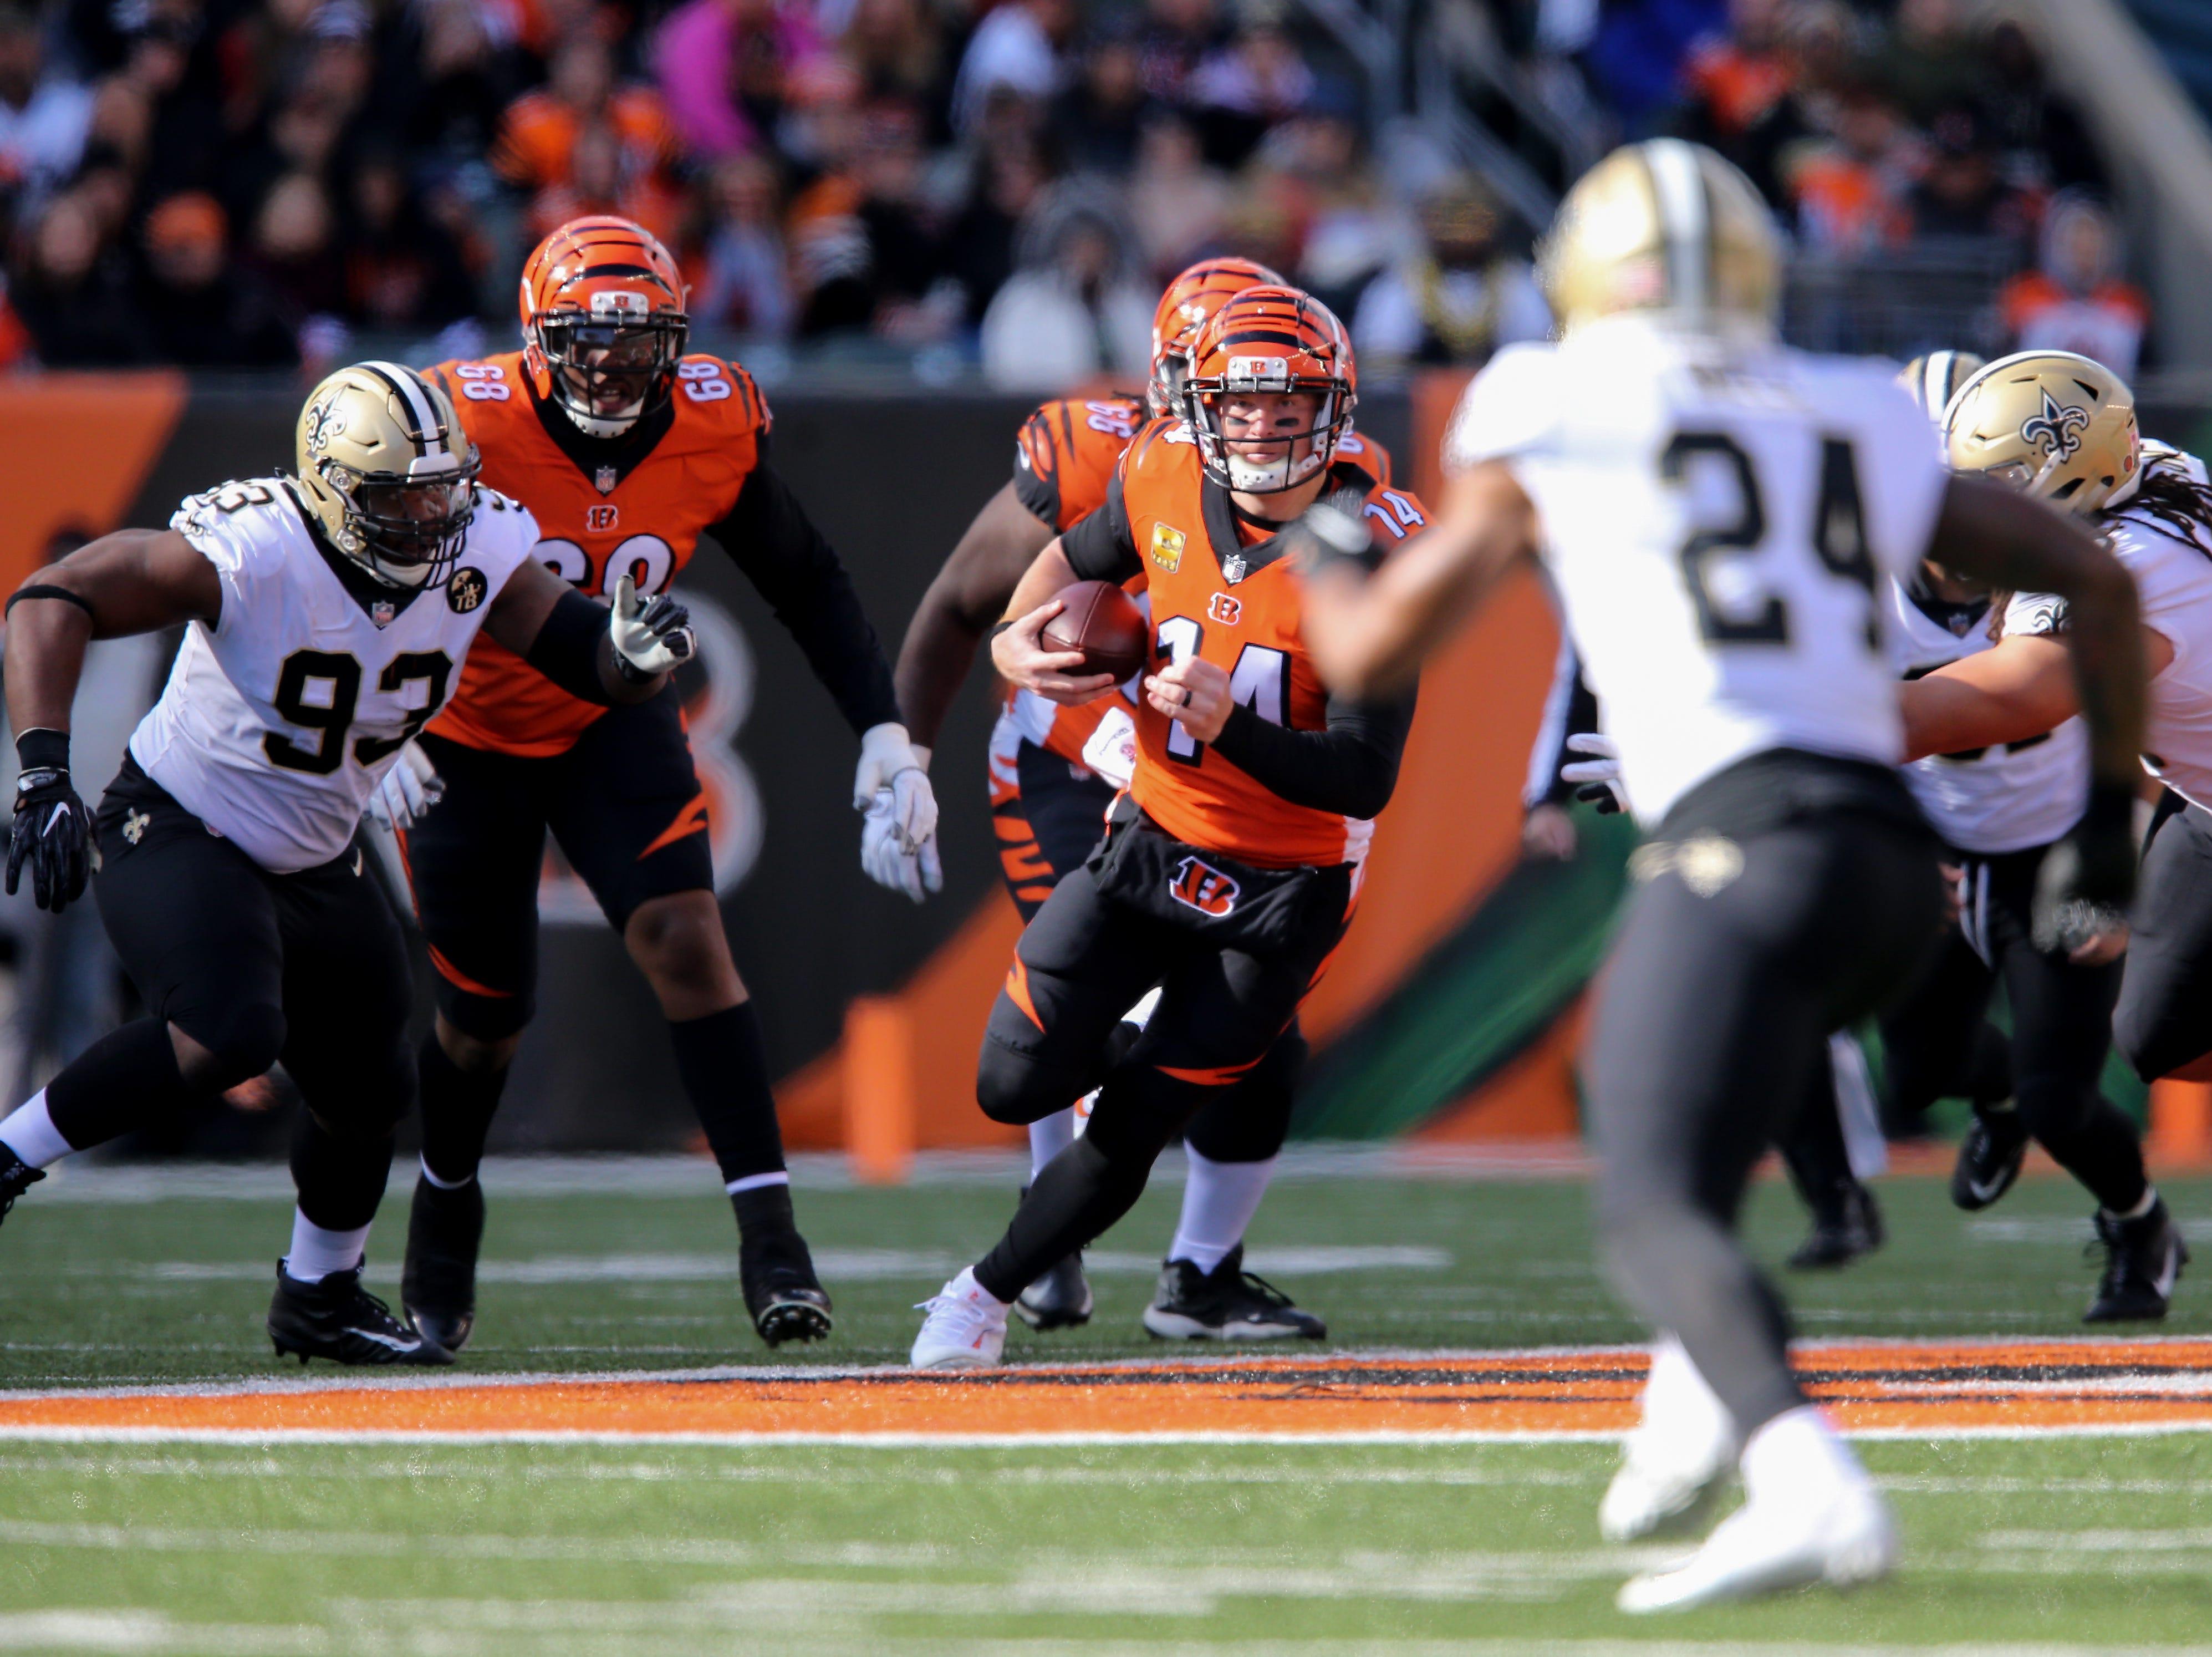 Cincinnati Bengals quarterback Andy Dalton (14) runs out of the pocket in the second quarter of a Week 10 NFL game between the New Orleans Saints and the Cincinnati Bengals, Sunday, Nov. 11, 2018, at Paul Brown Stadium in Cincinnati.